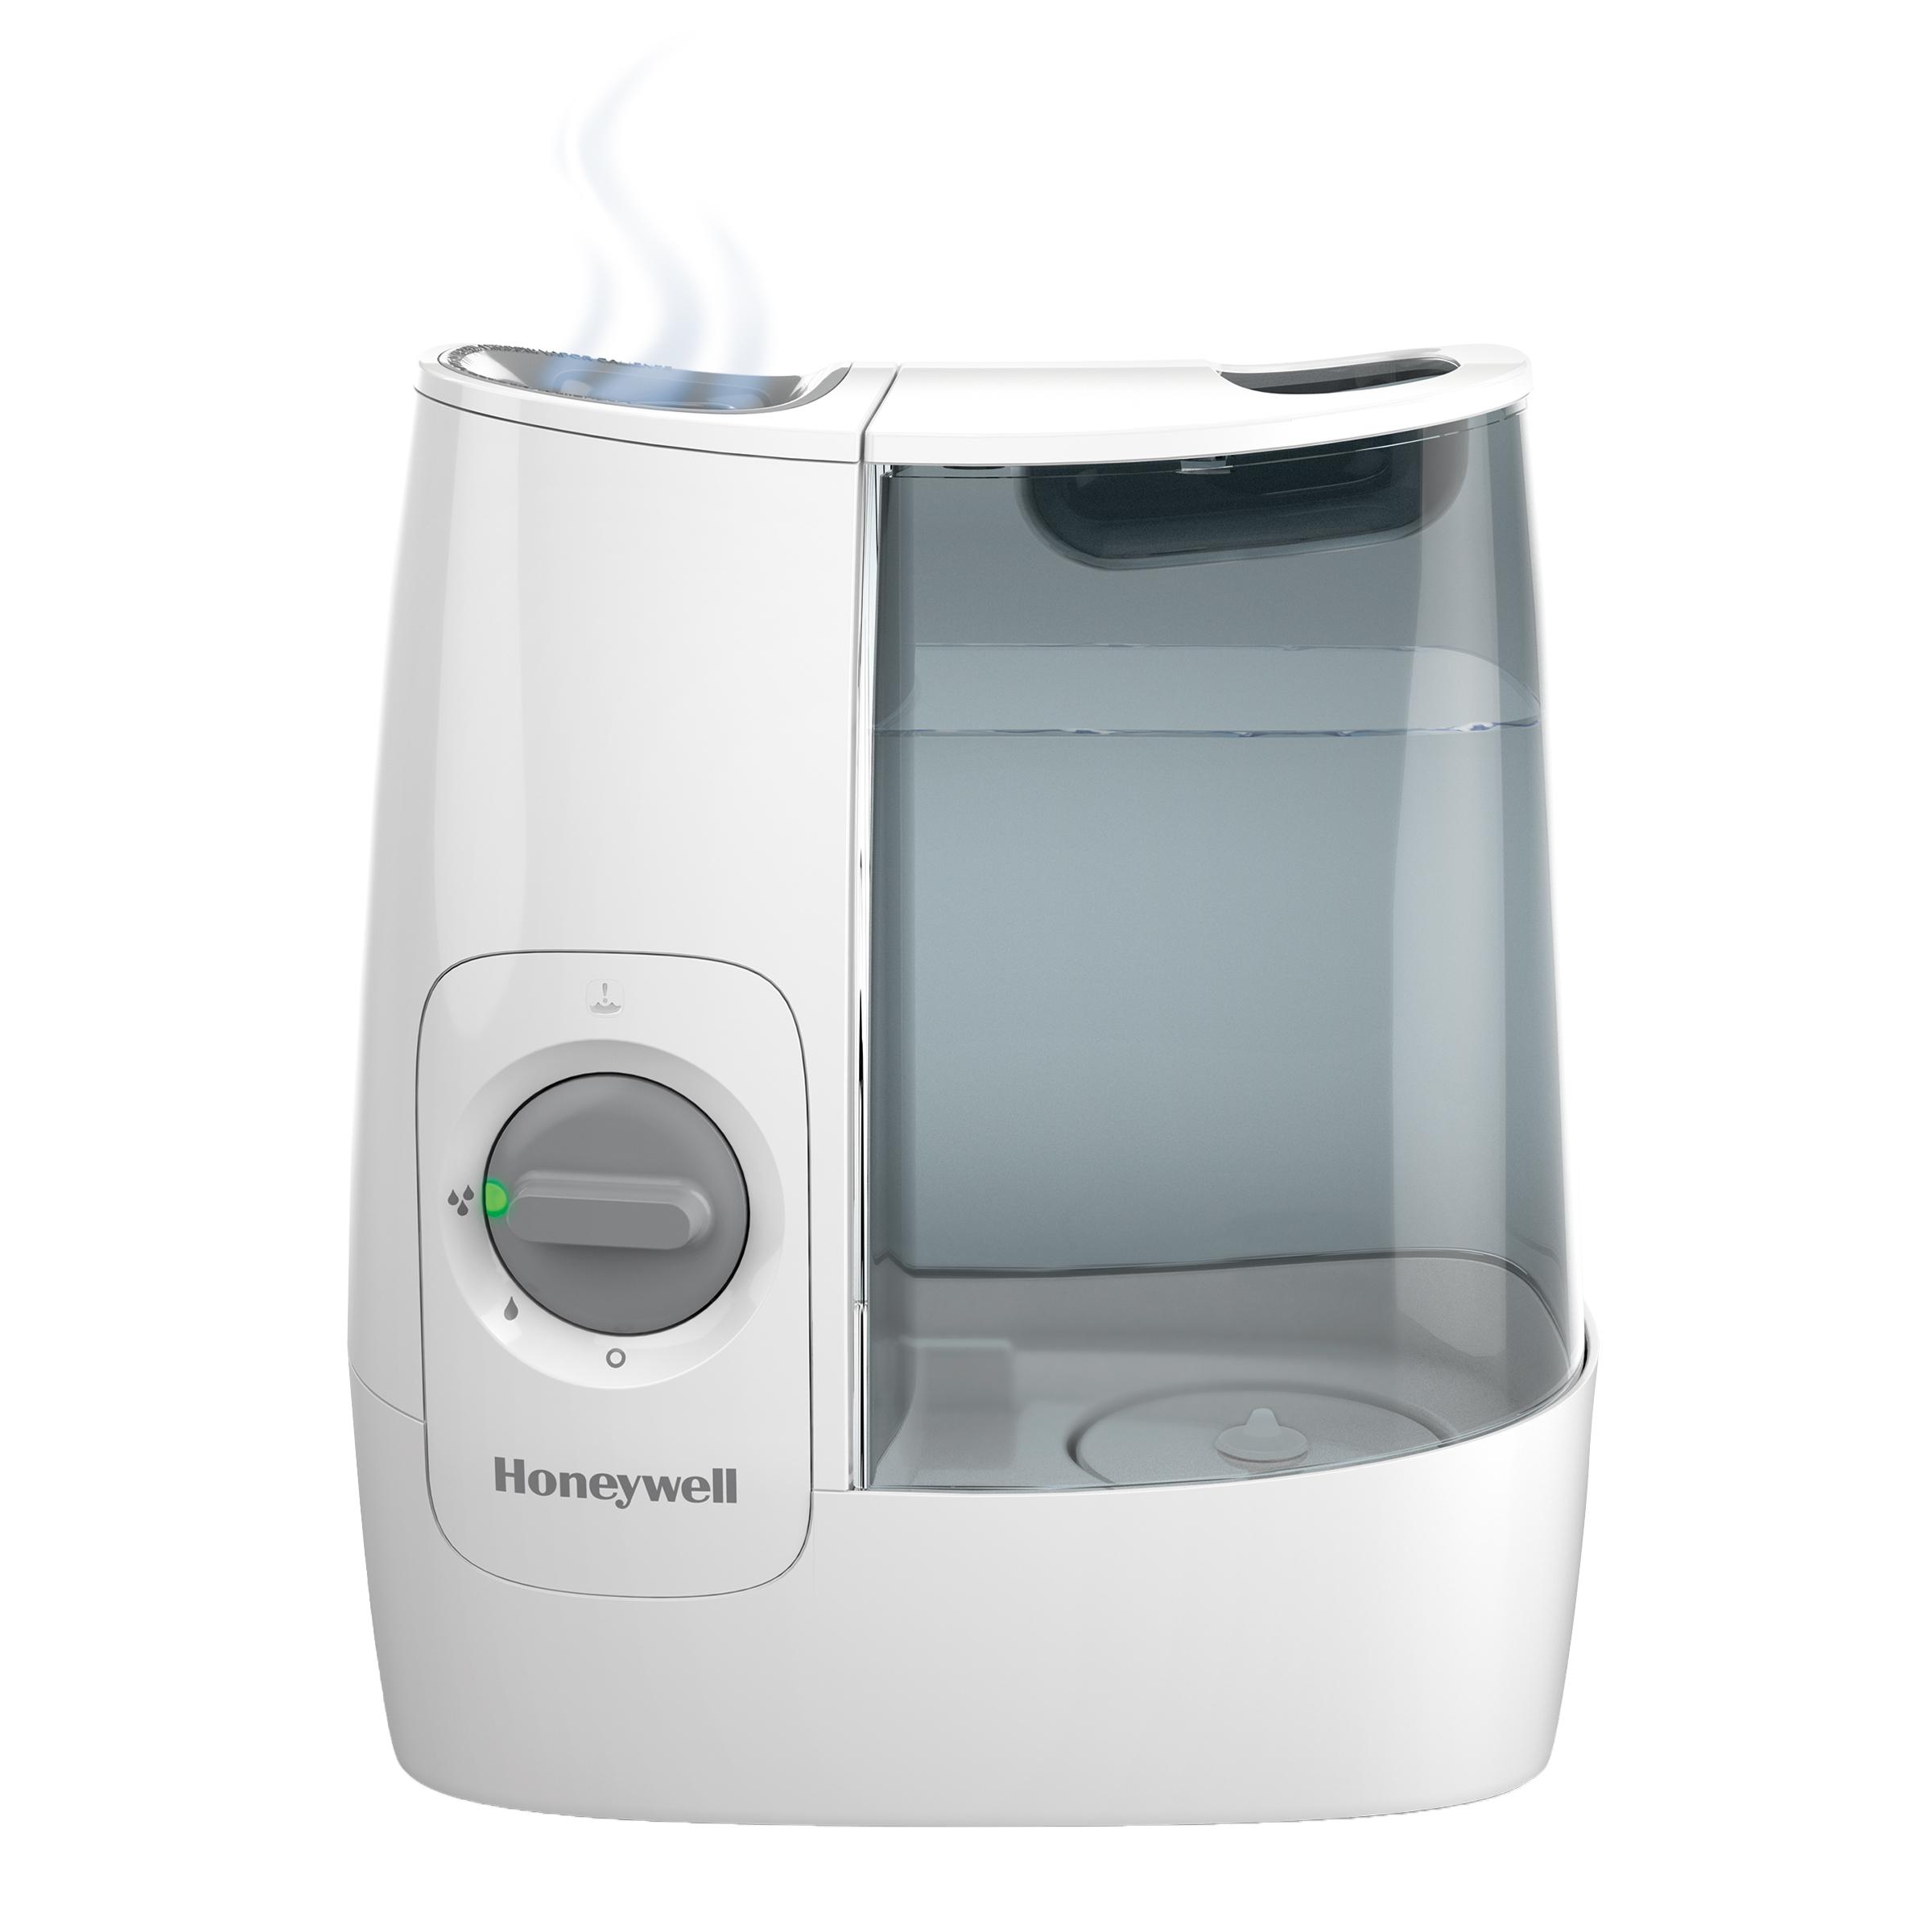 Honeywell Filter Free Warm Mist Humidifier HWM845WWM, White